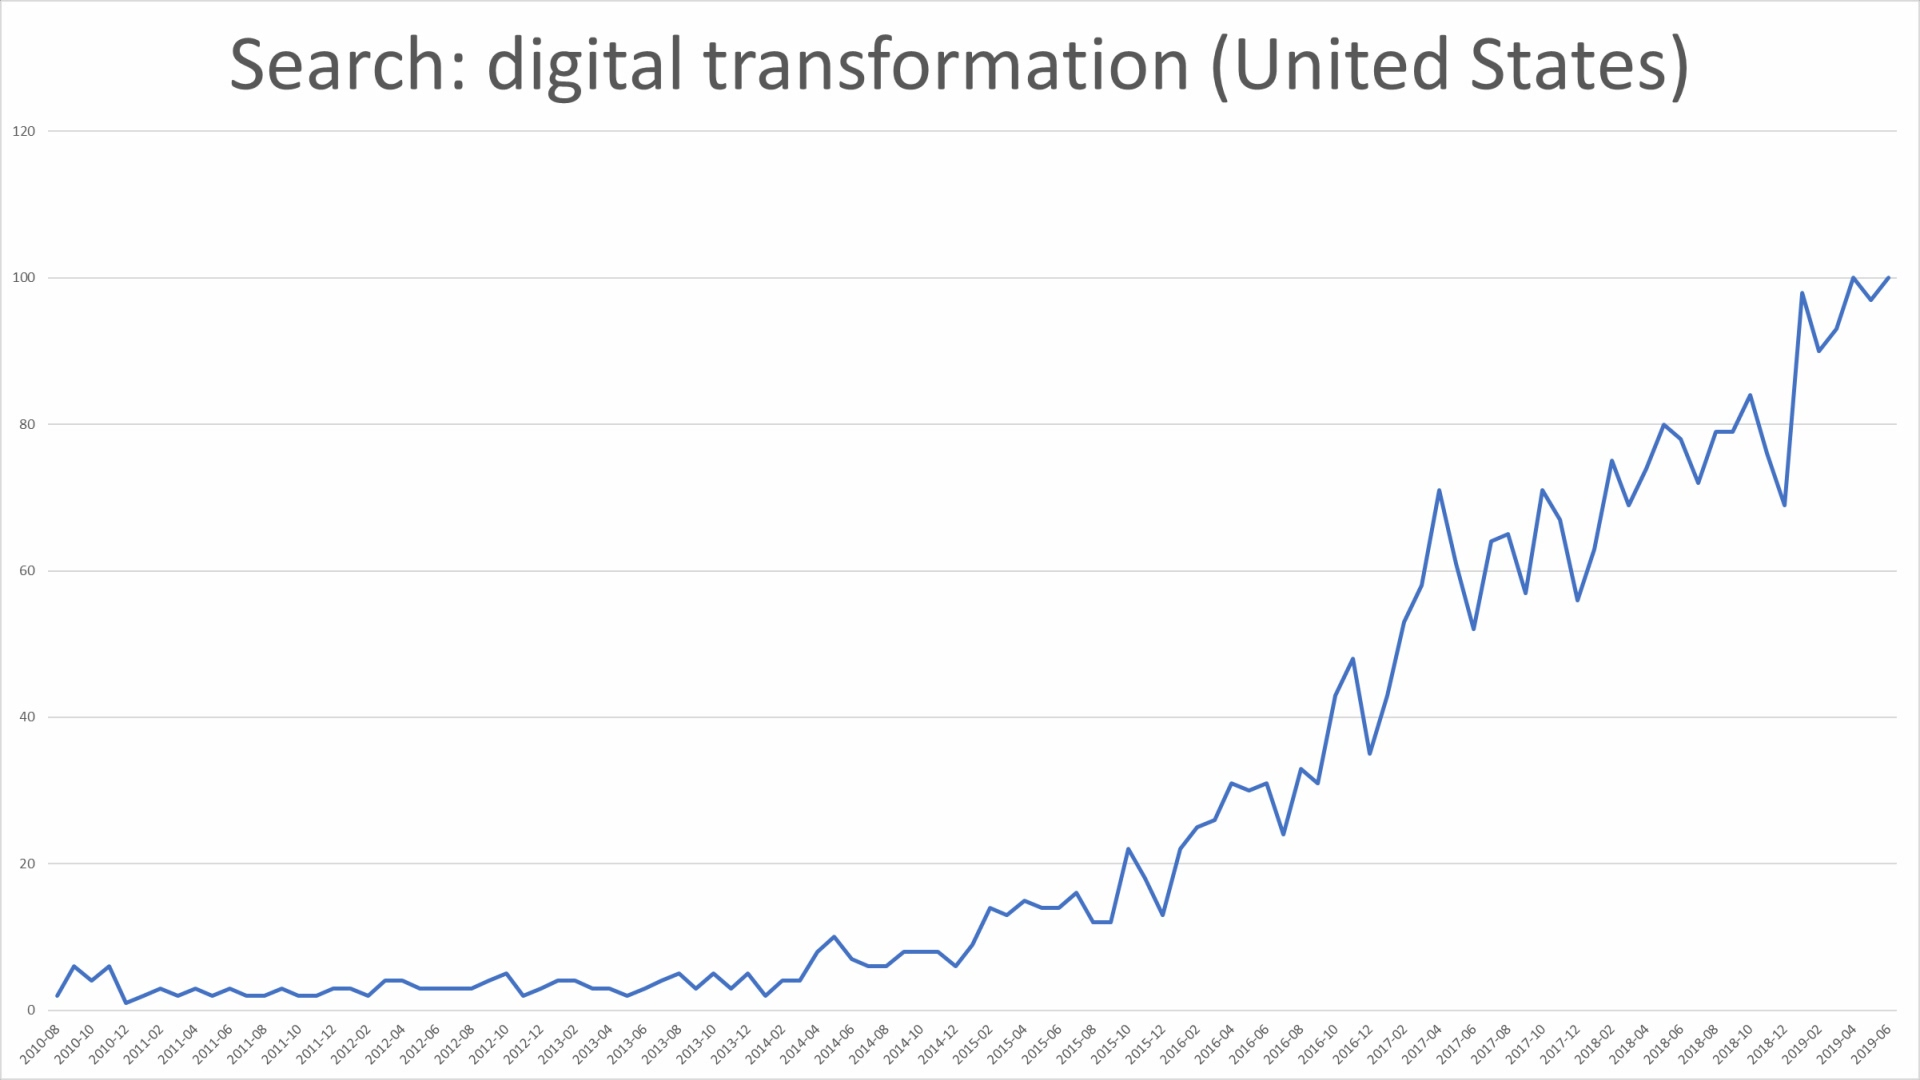 Digitial transformation